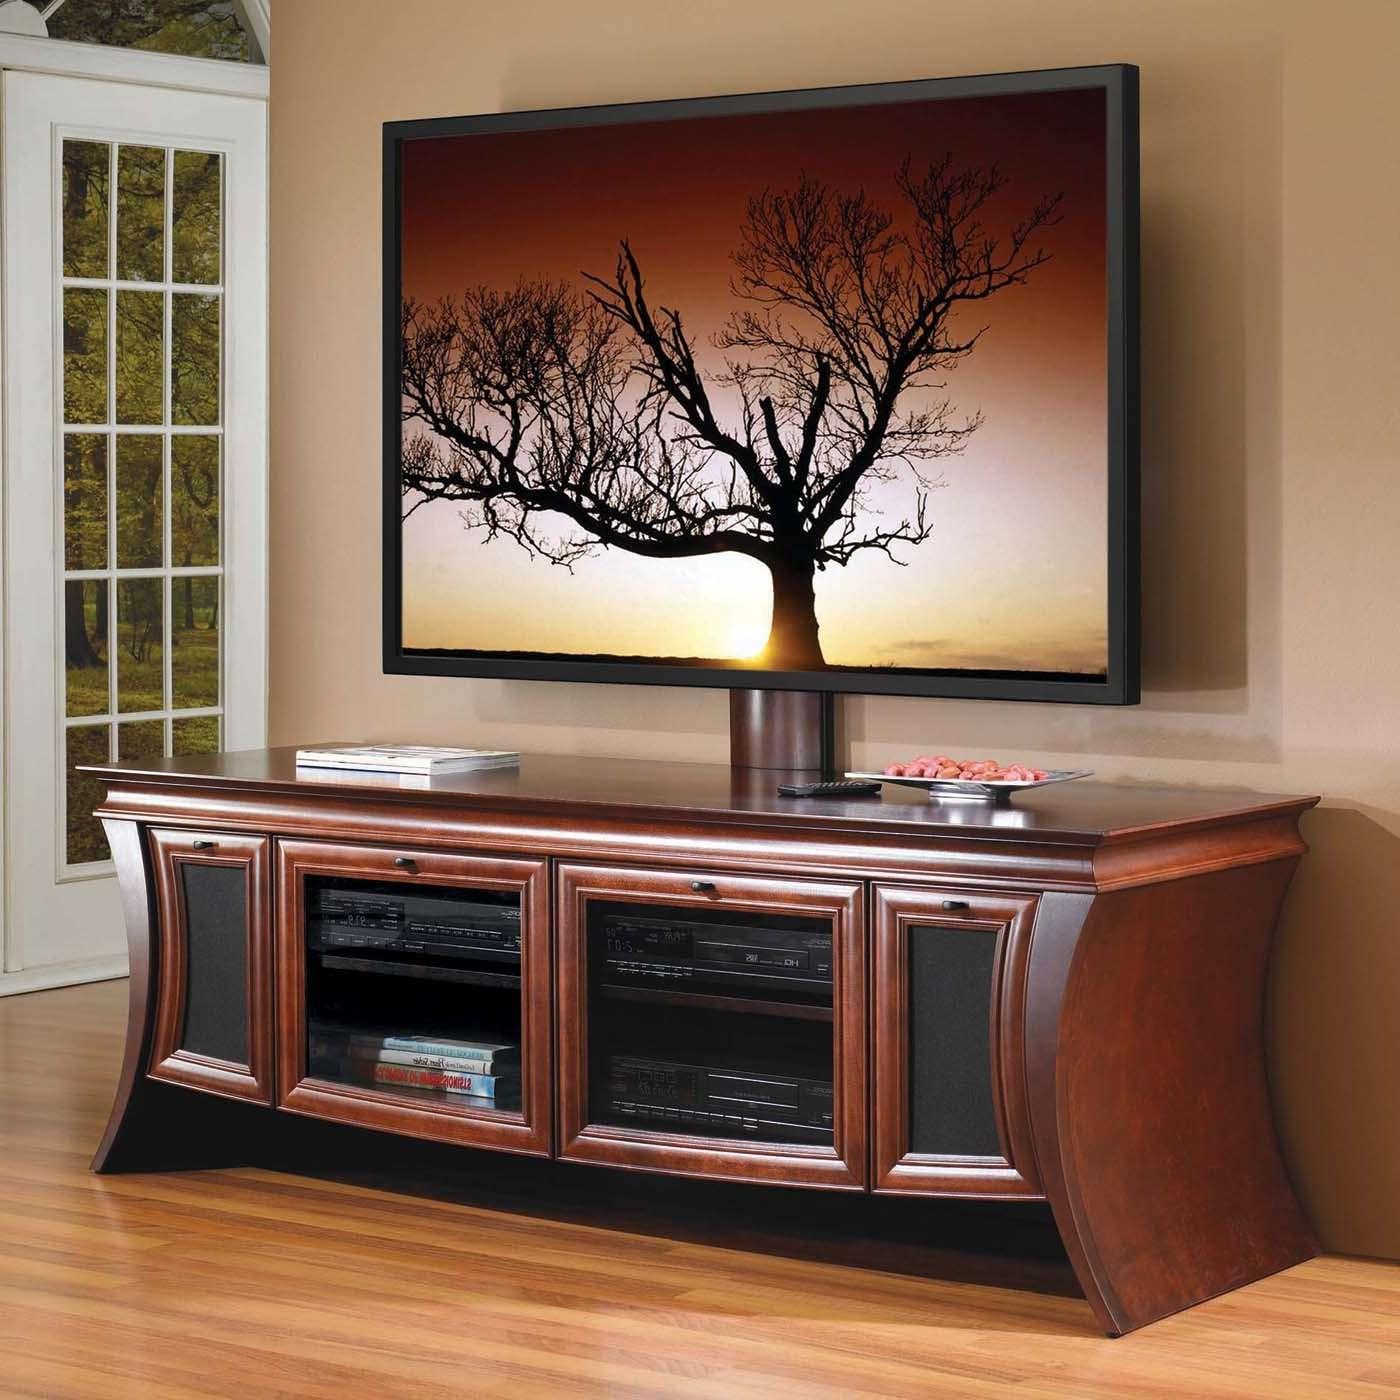 Furnitures Media Stands For Flat Screen Tvs Furniture The Best In Big Tv Stands Furniture (View 8 of 15)